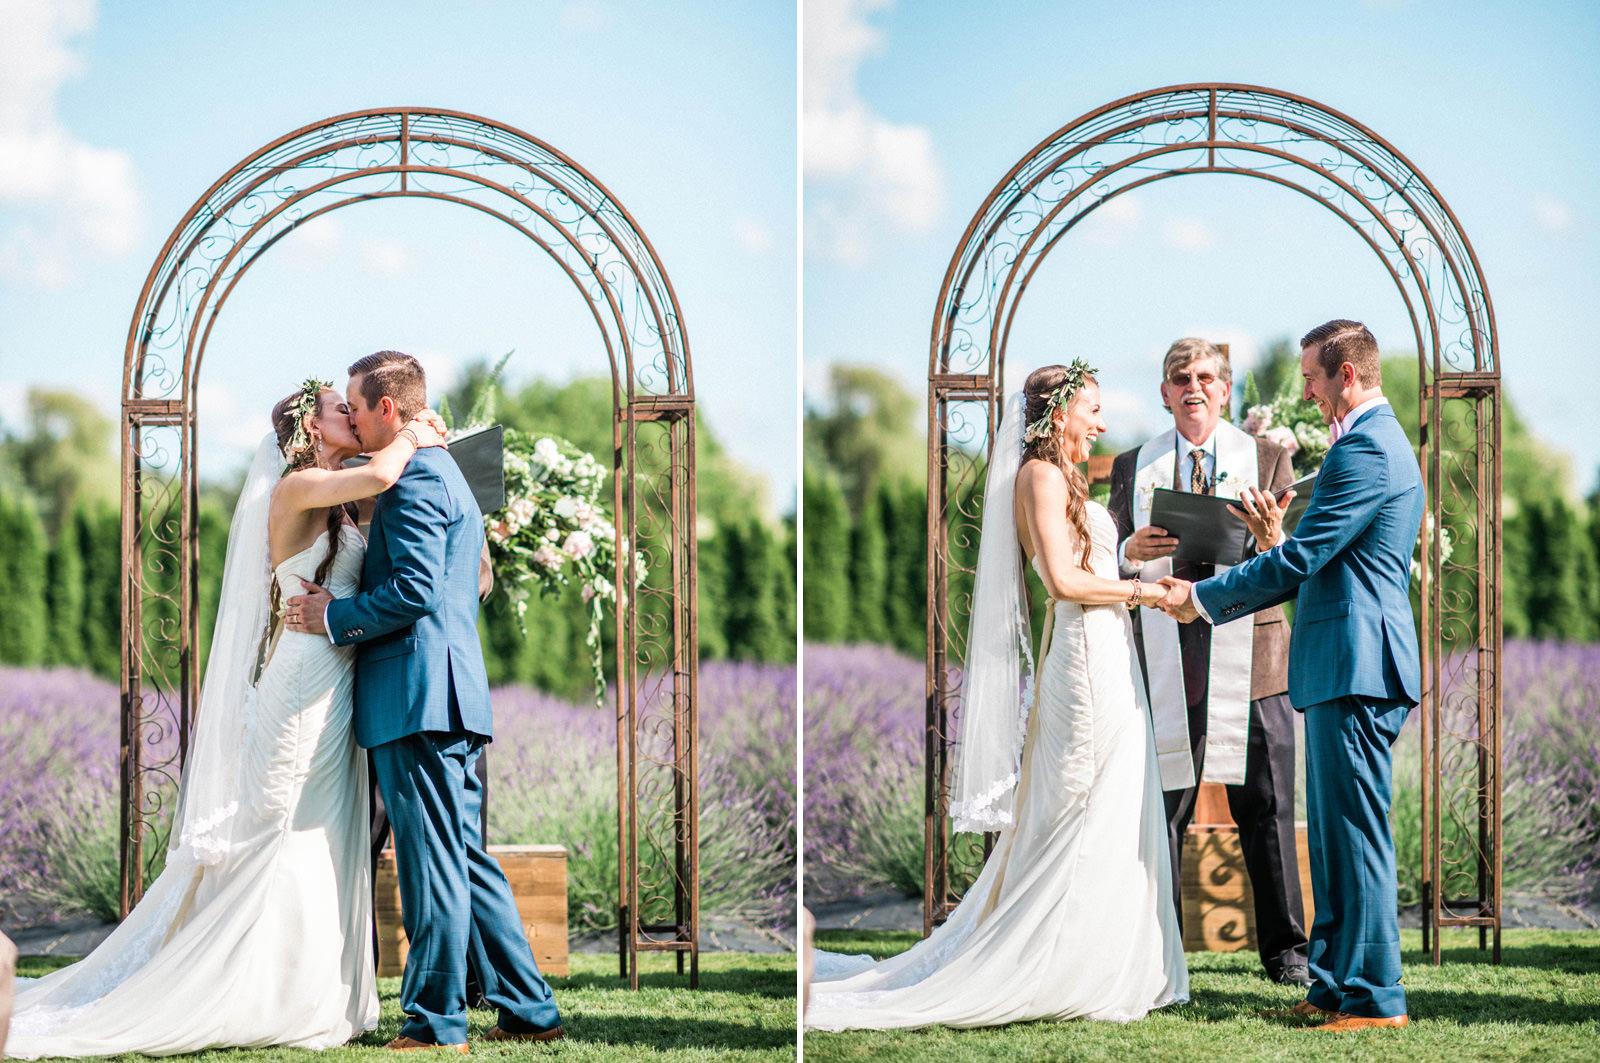 046-woodinville-lavendar-farm-wedding-with-golden-glowy-photos.jpg